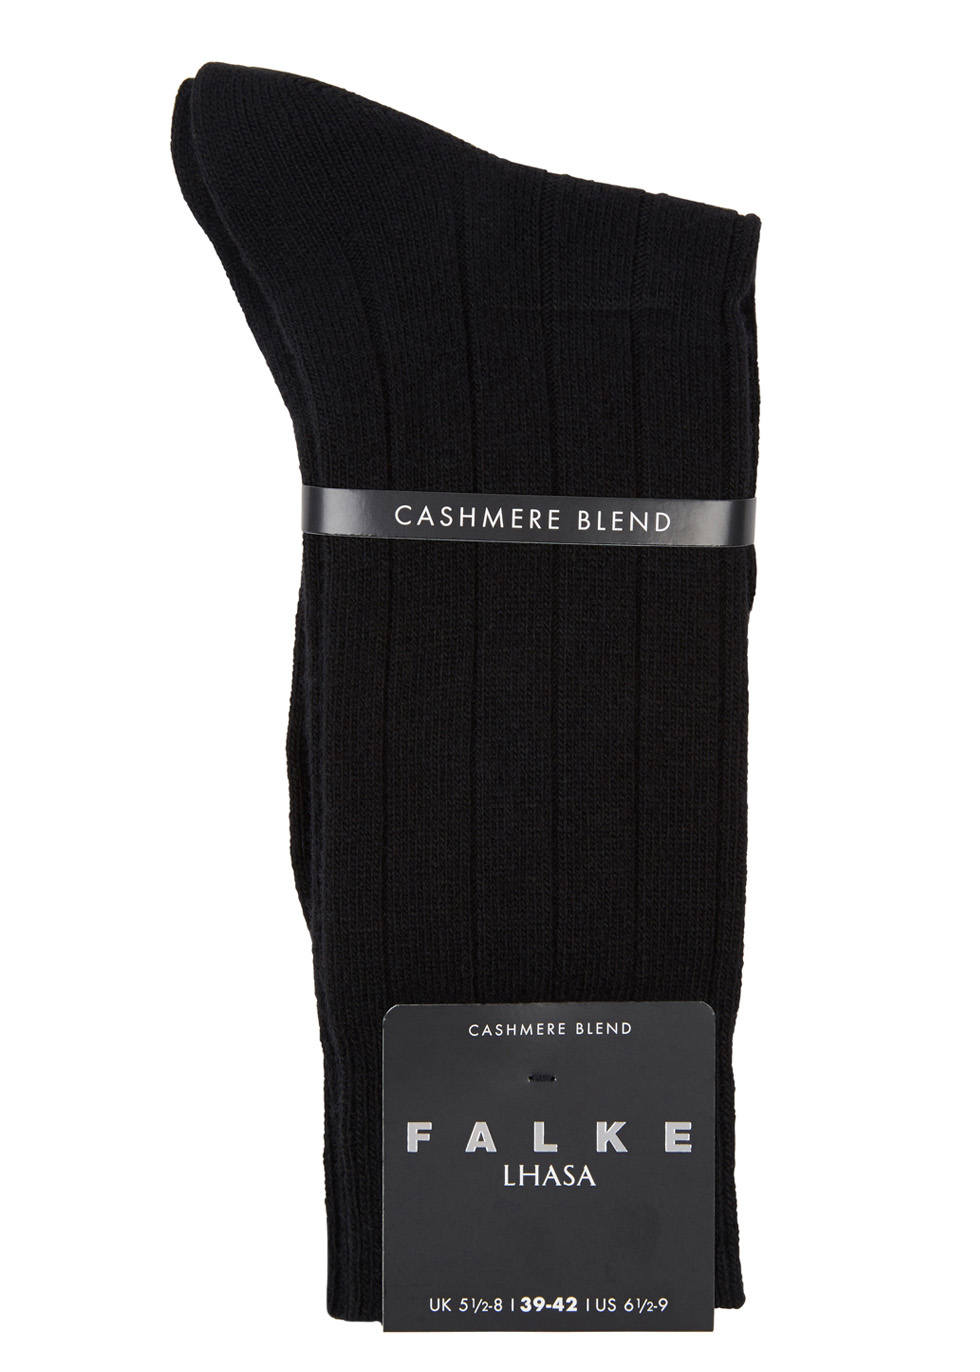 Black cashmere blend socks - Falke